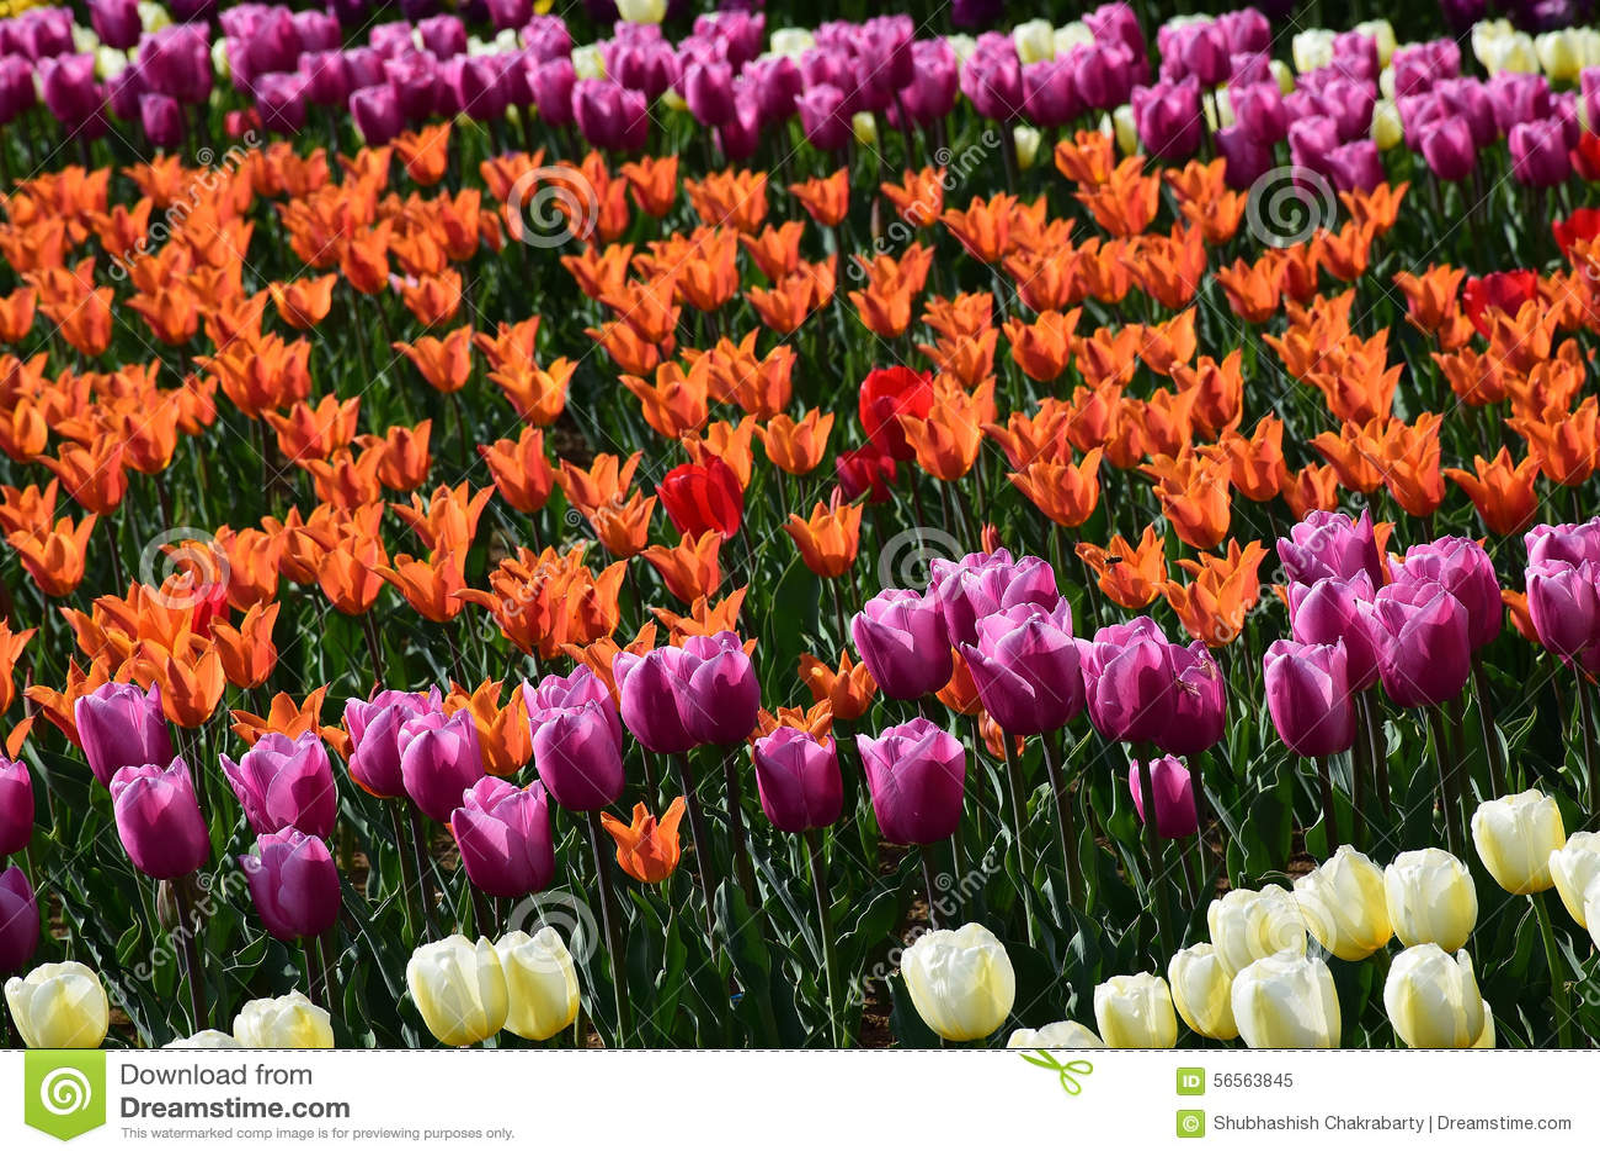 Download Κήπος τουλιπών άνοιξη στην ηλιοφάνεια Στοκ Εικόνα - εικόνα από ανθοκόμος, ανθίζοντας: 56563845